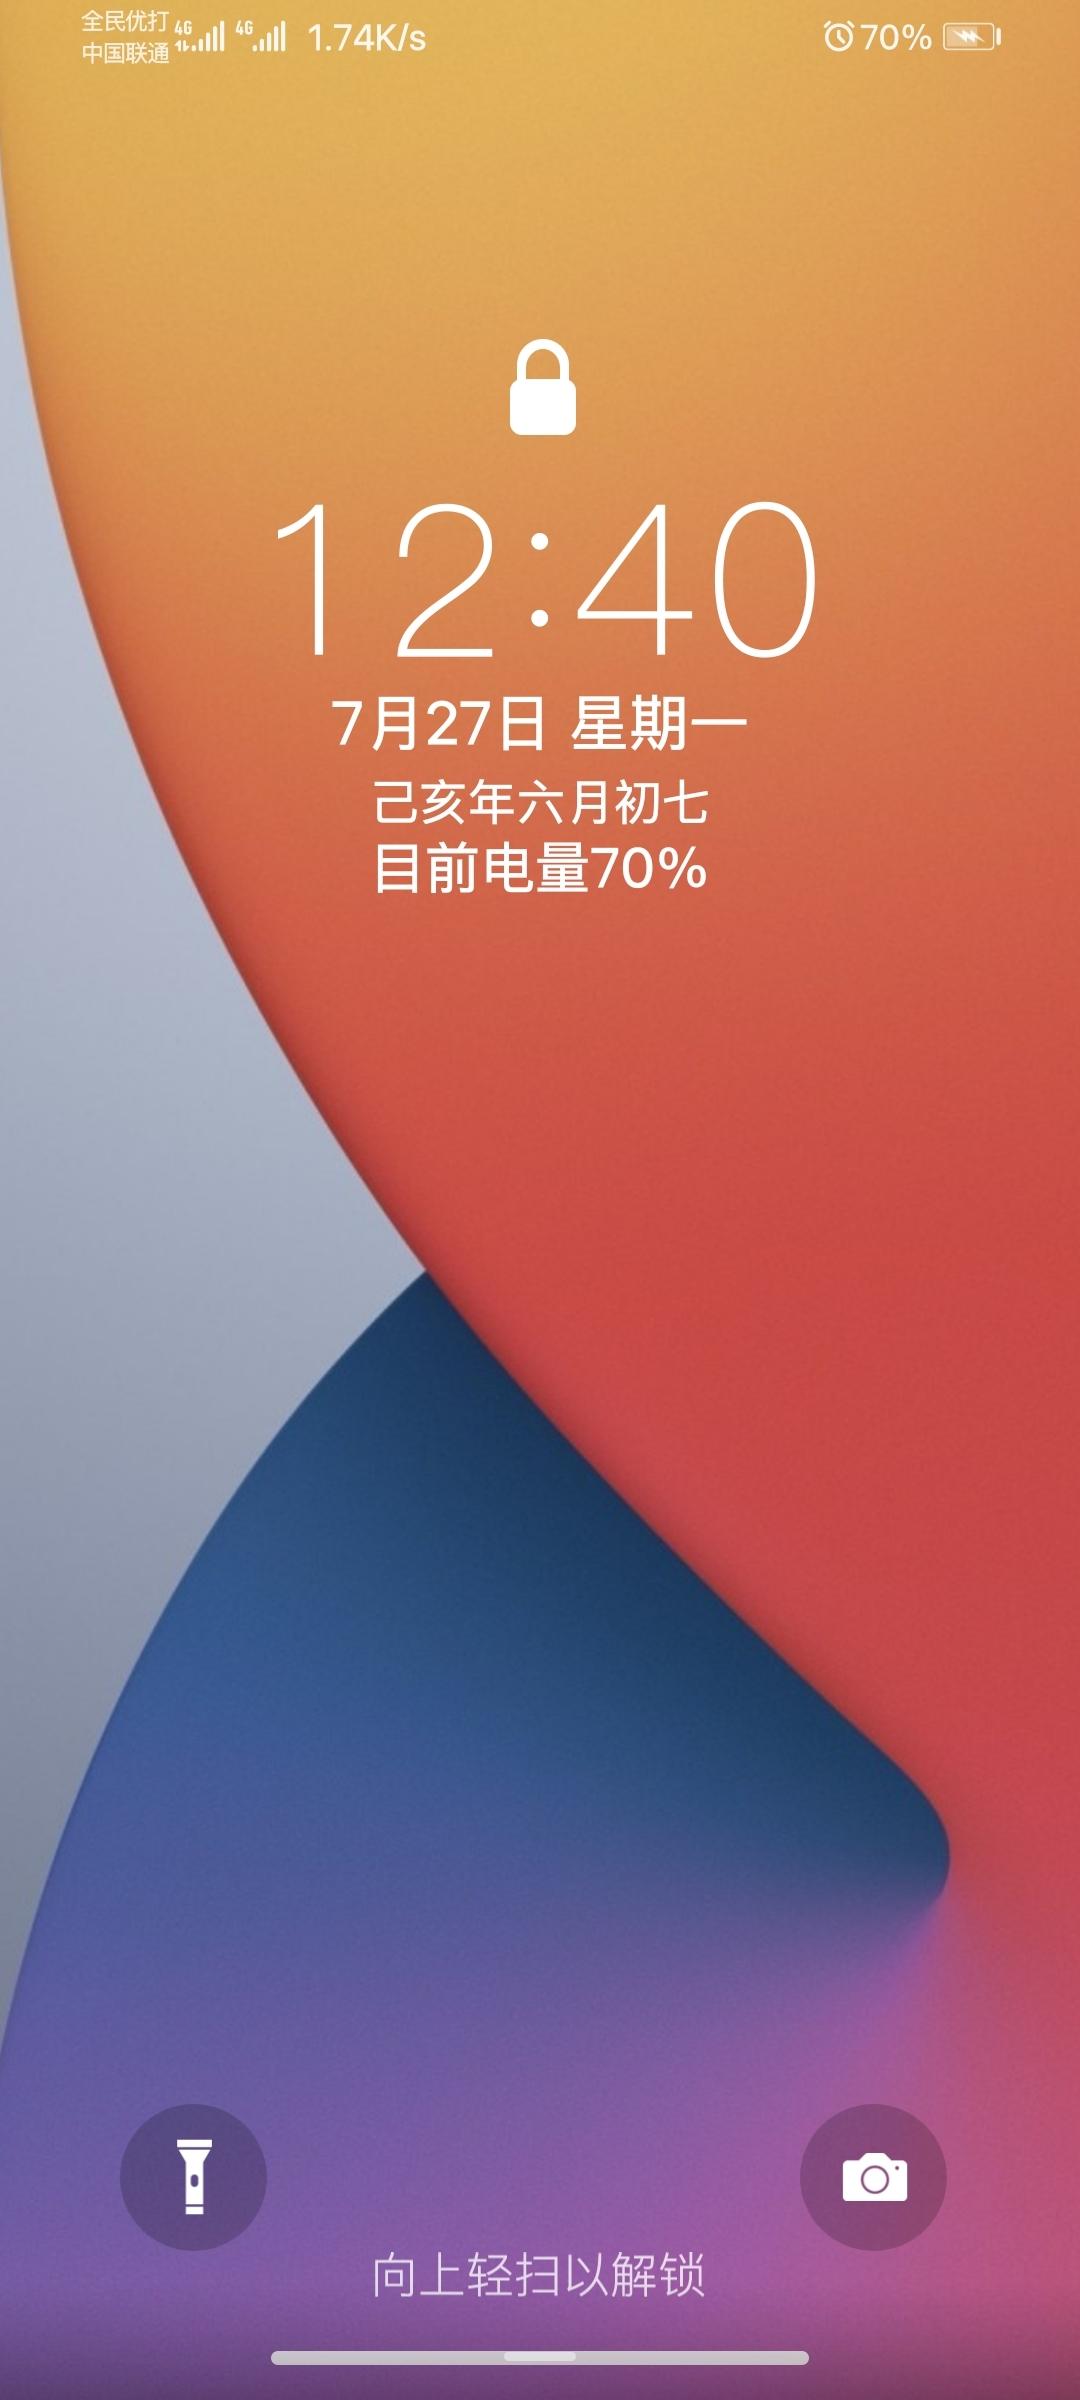 Screenshot_20200727_124022_com.android.keyguard.jpg